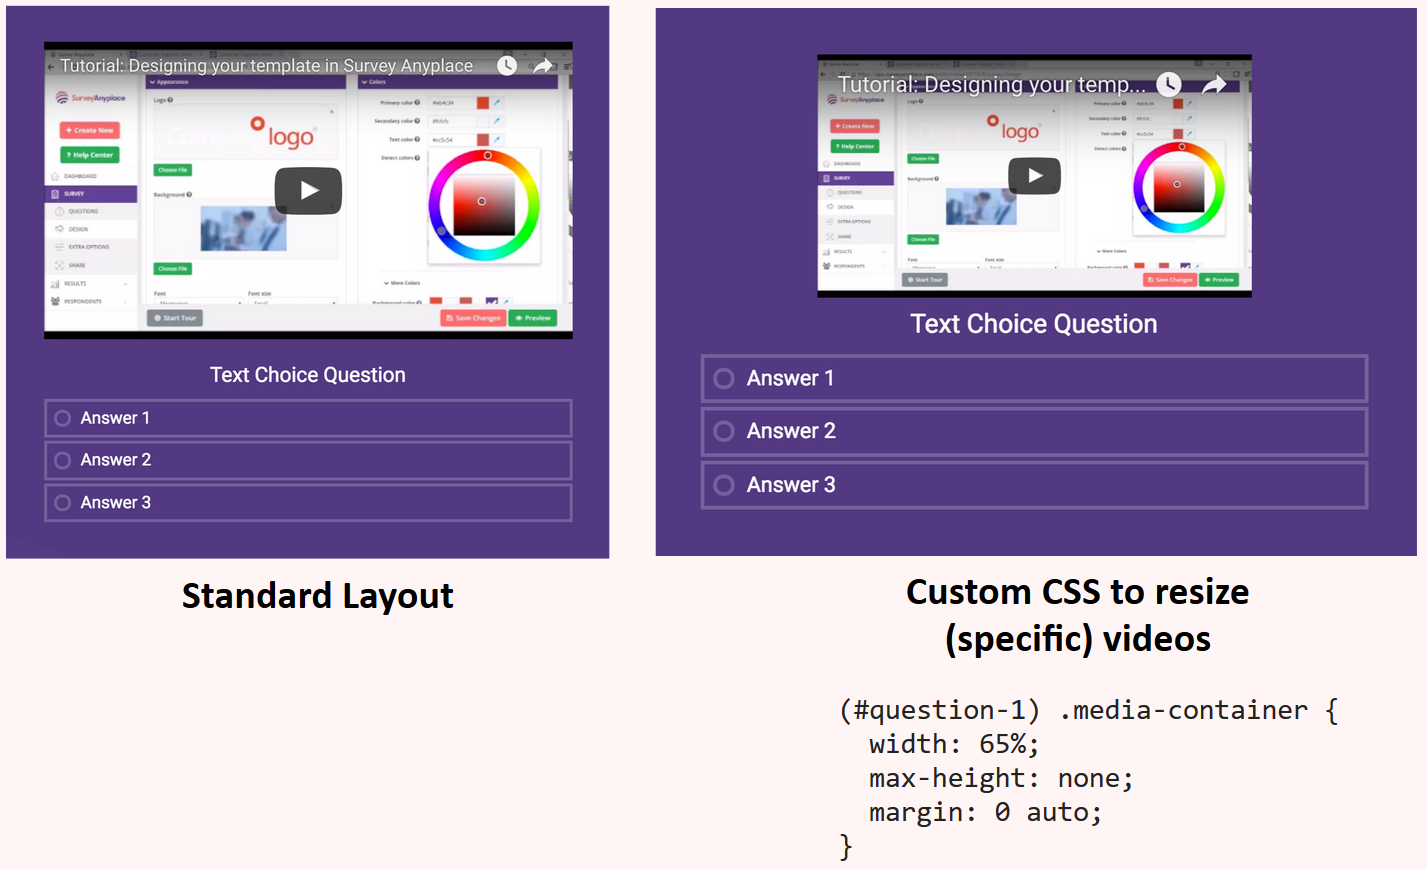 Custom CSS resize videos